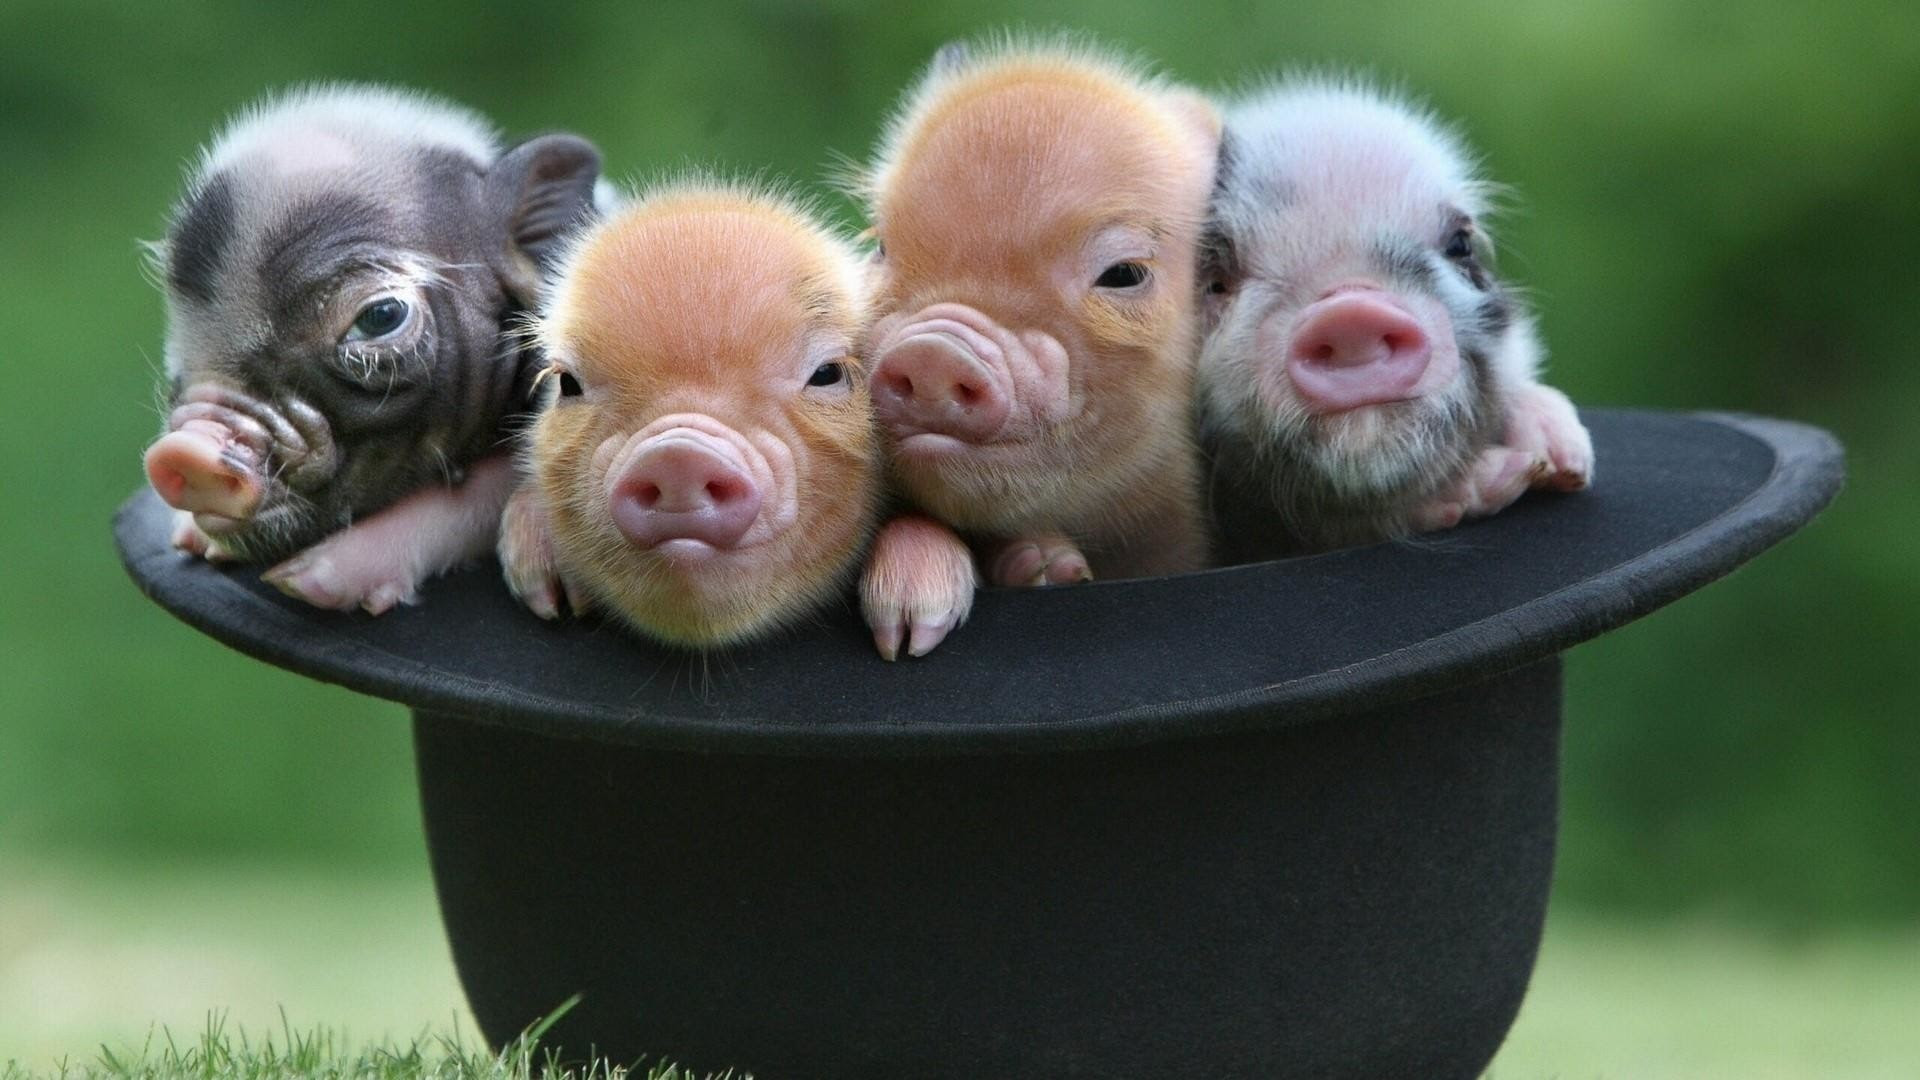 Pig Wallpaper (62+ images)